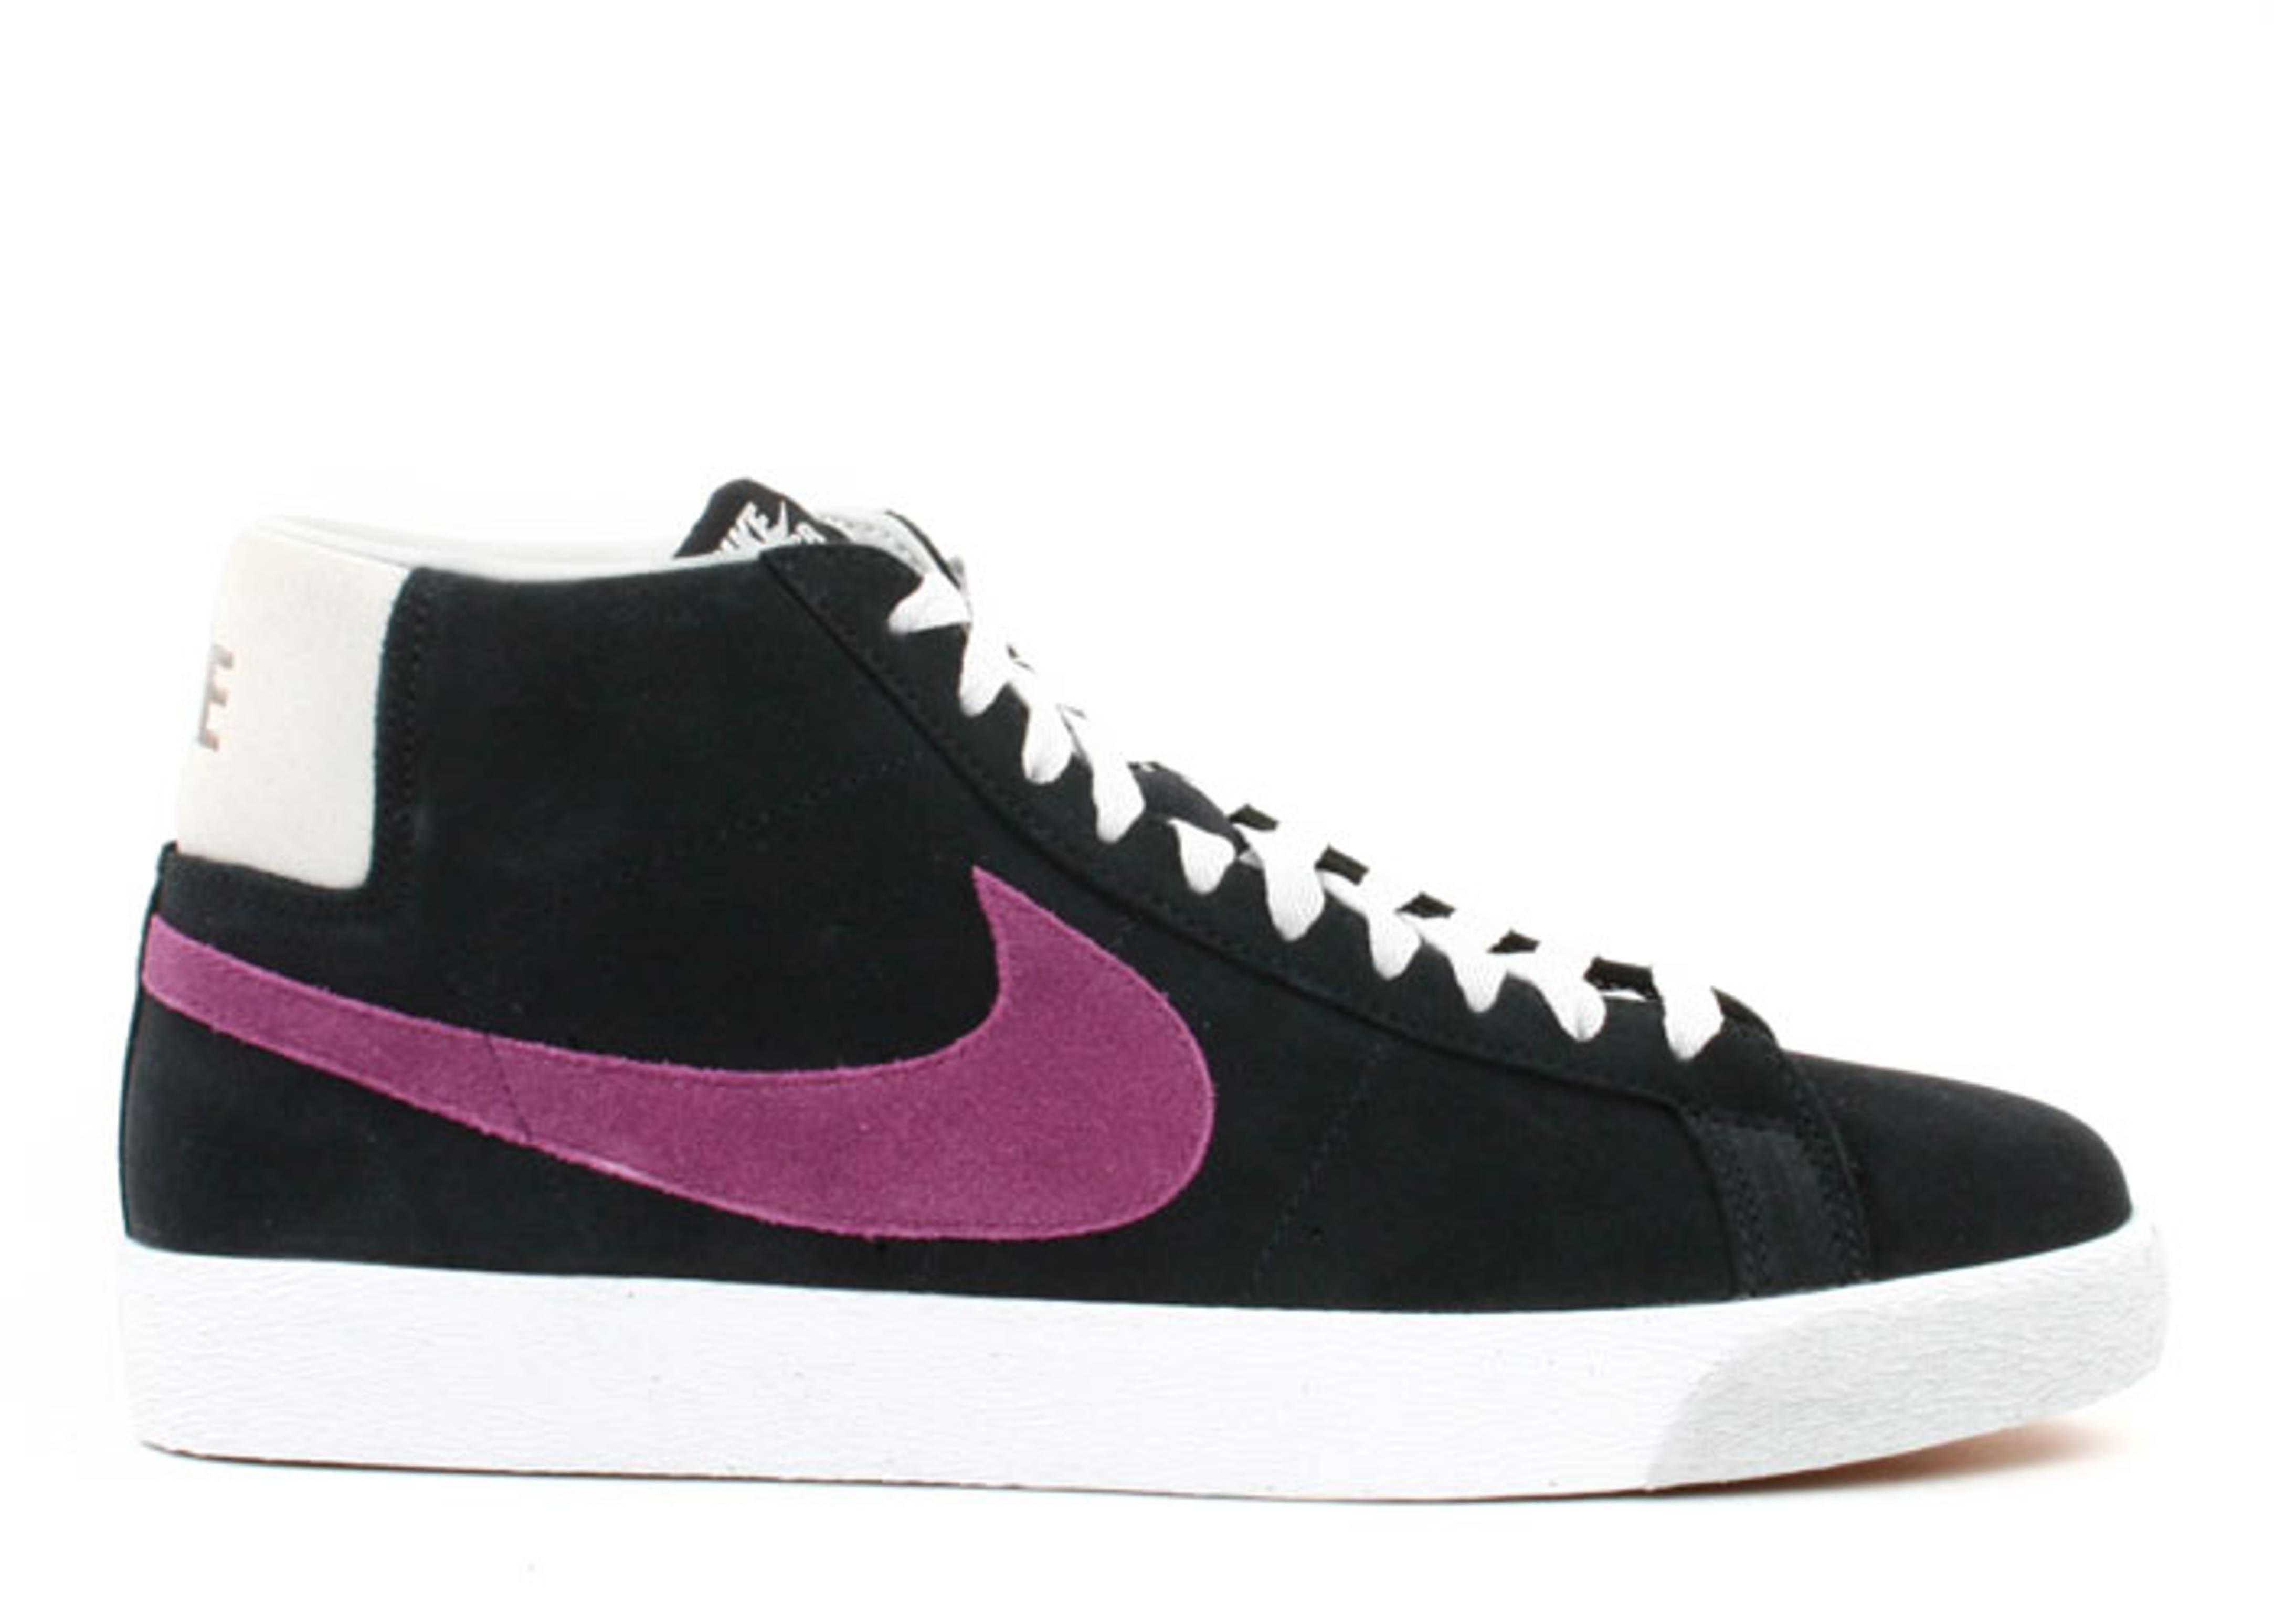 new products d9509 bae32 Blazer Sb - Nike - 310801 451 - city navy/viotech-neutral ...